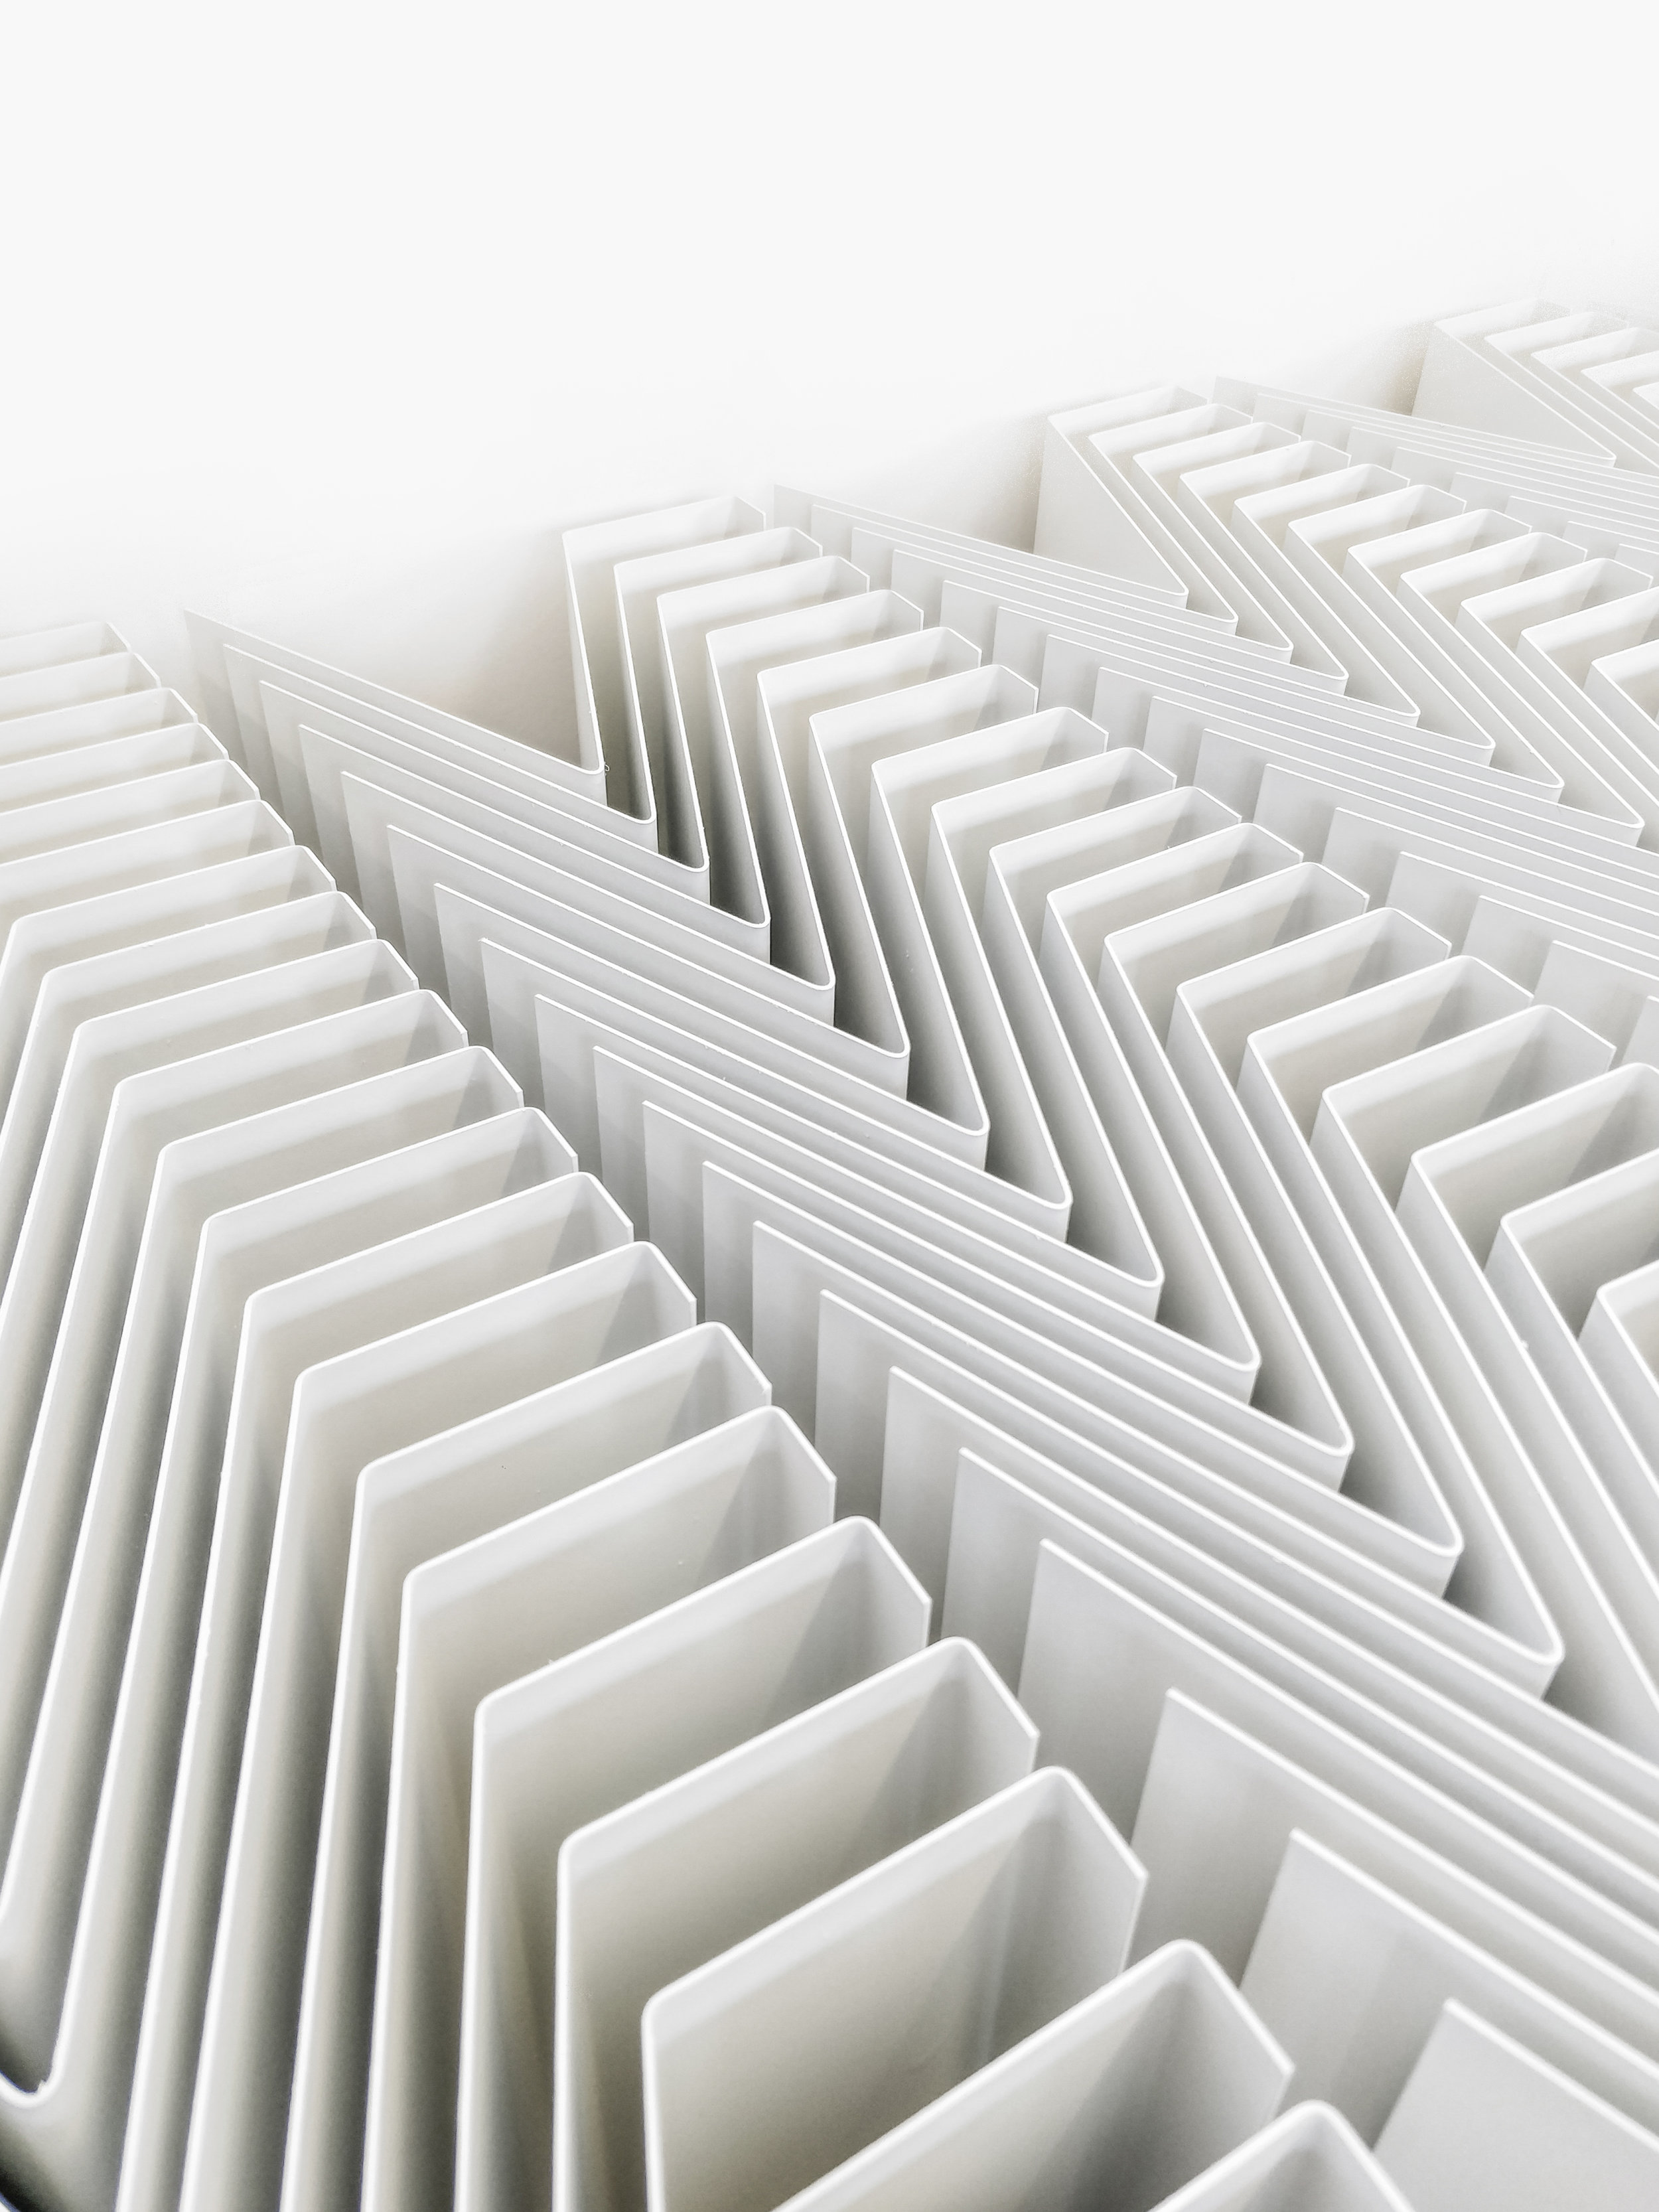 Folded steel sheet // Display